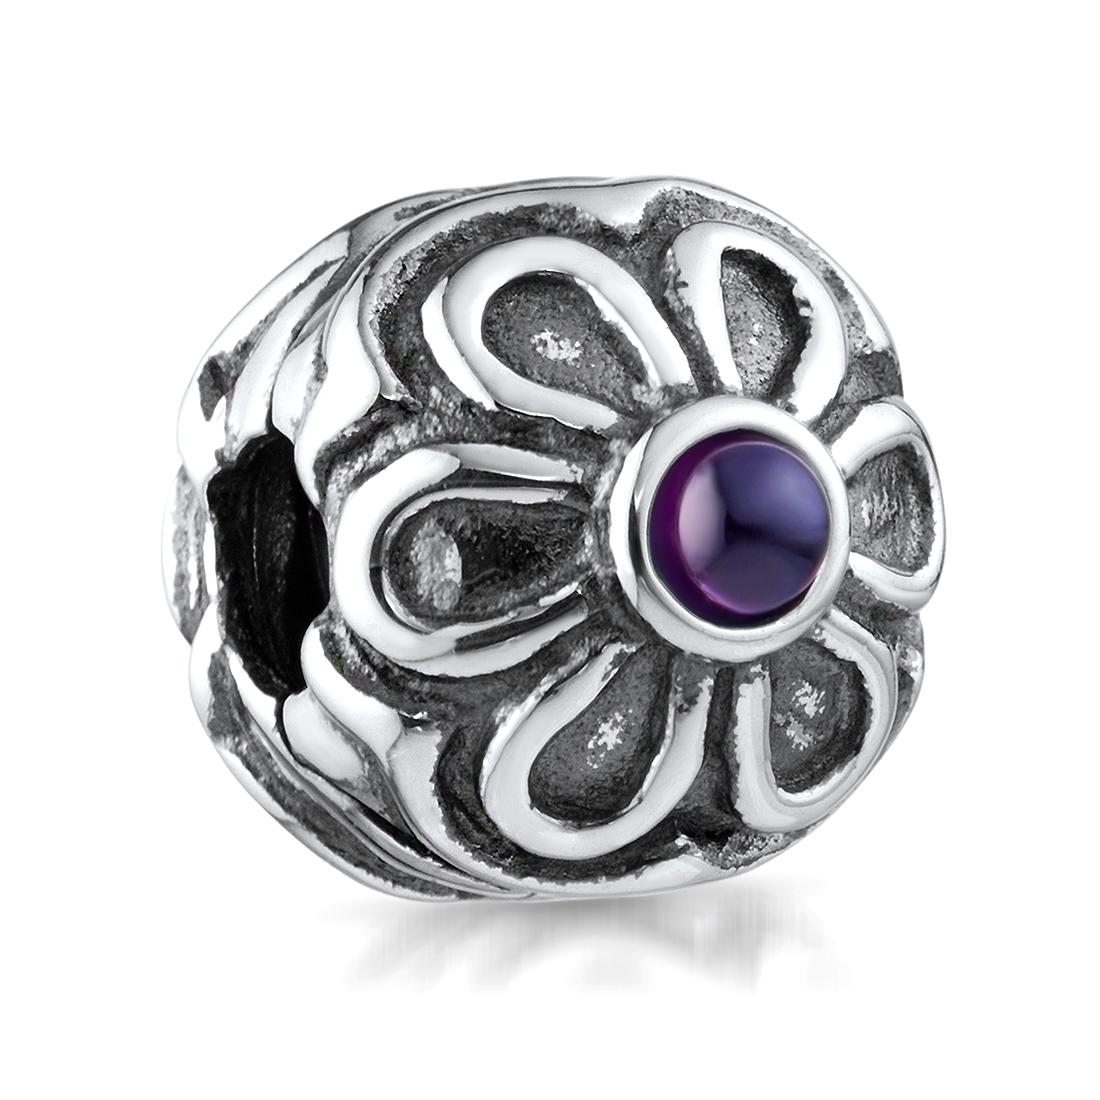 Anhänger CHARMS °  BLUME BLÜTE STRASS ° für Bettelarmband Kette Beads Charm